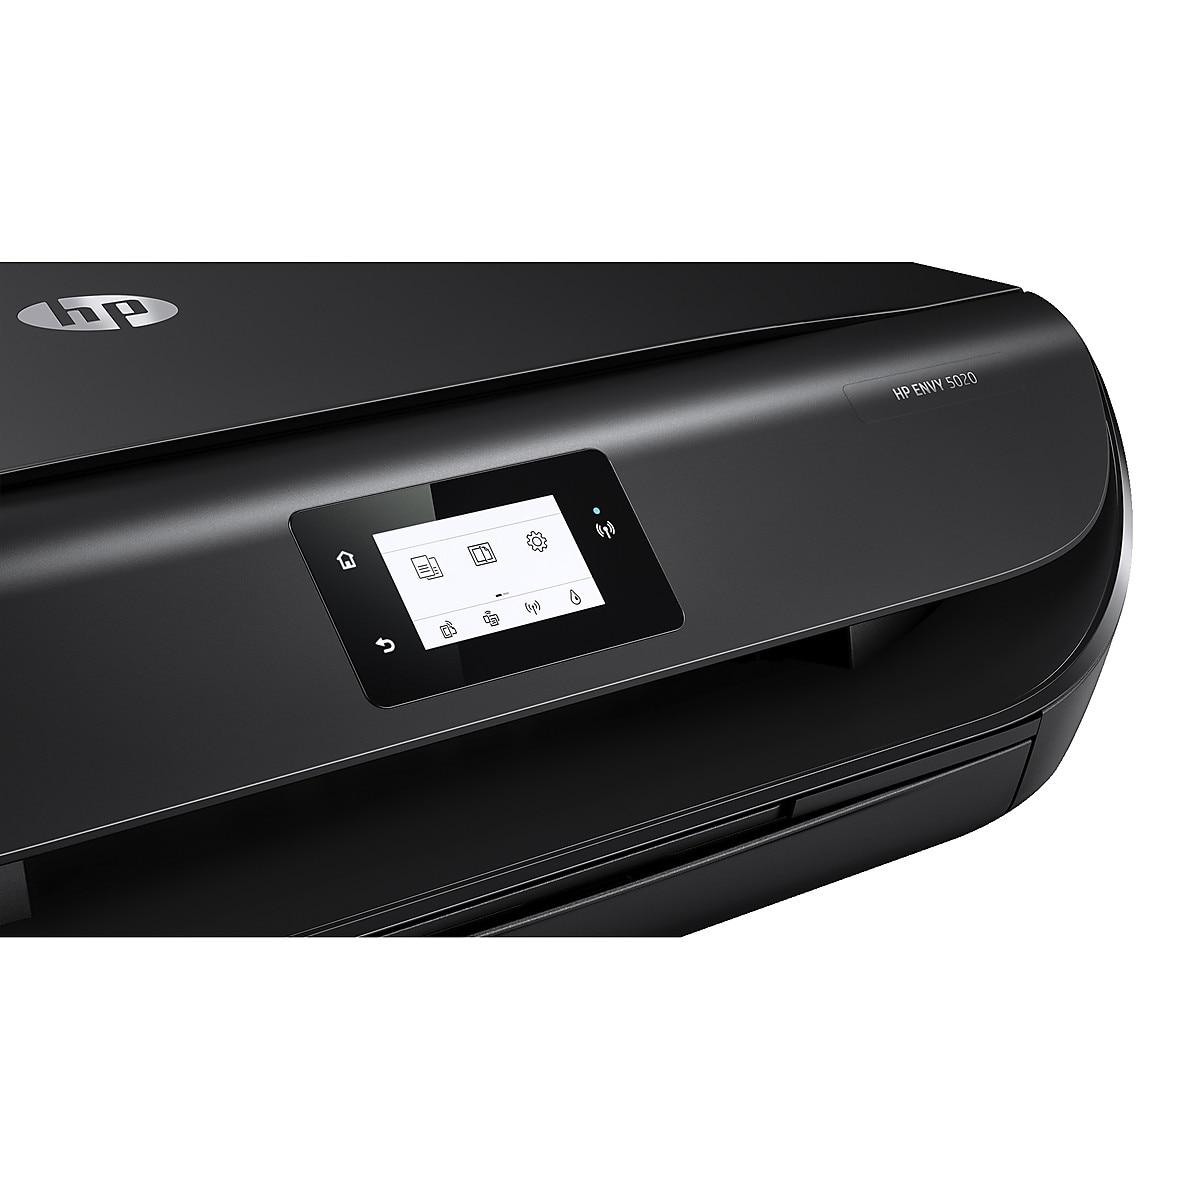 HP Envy 5020 AiO, skrivare